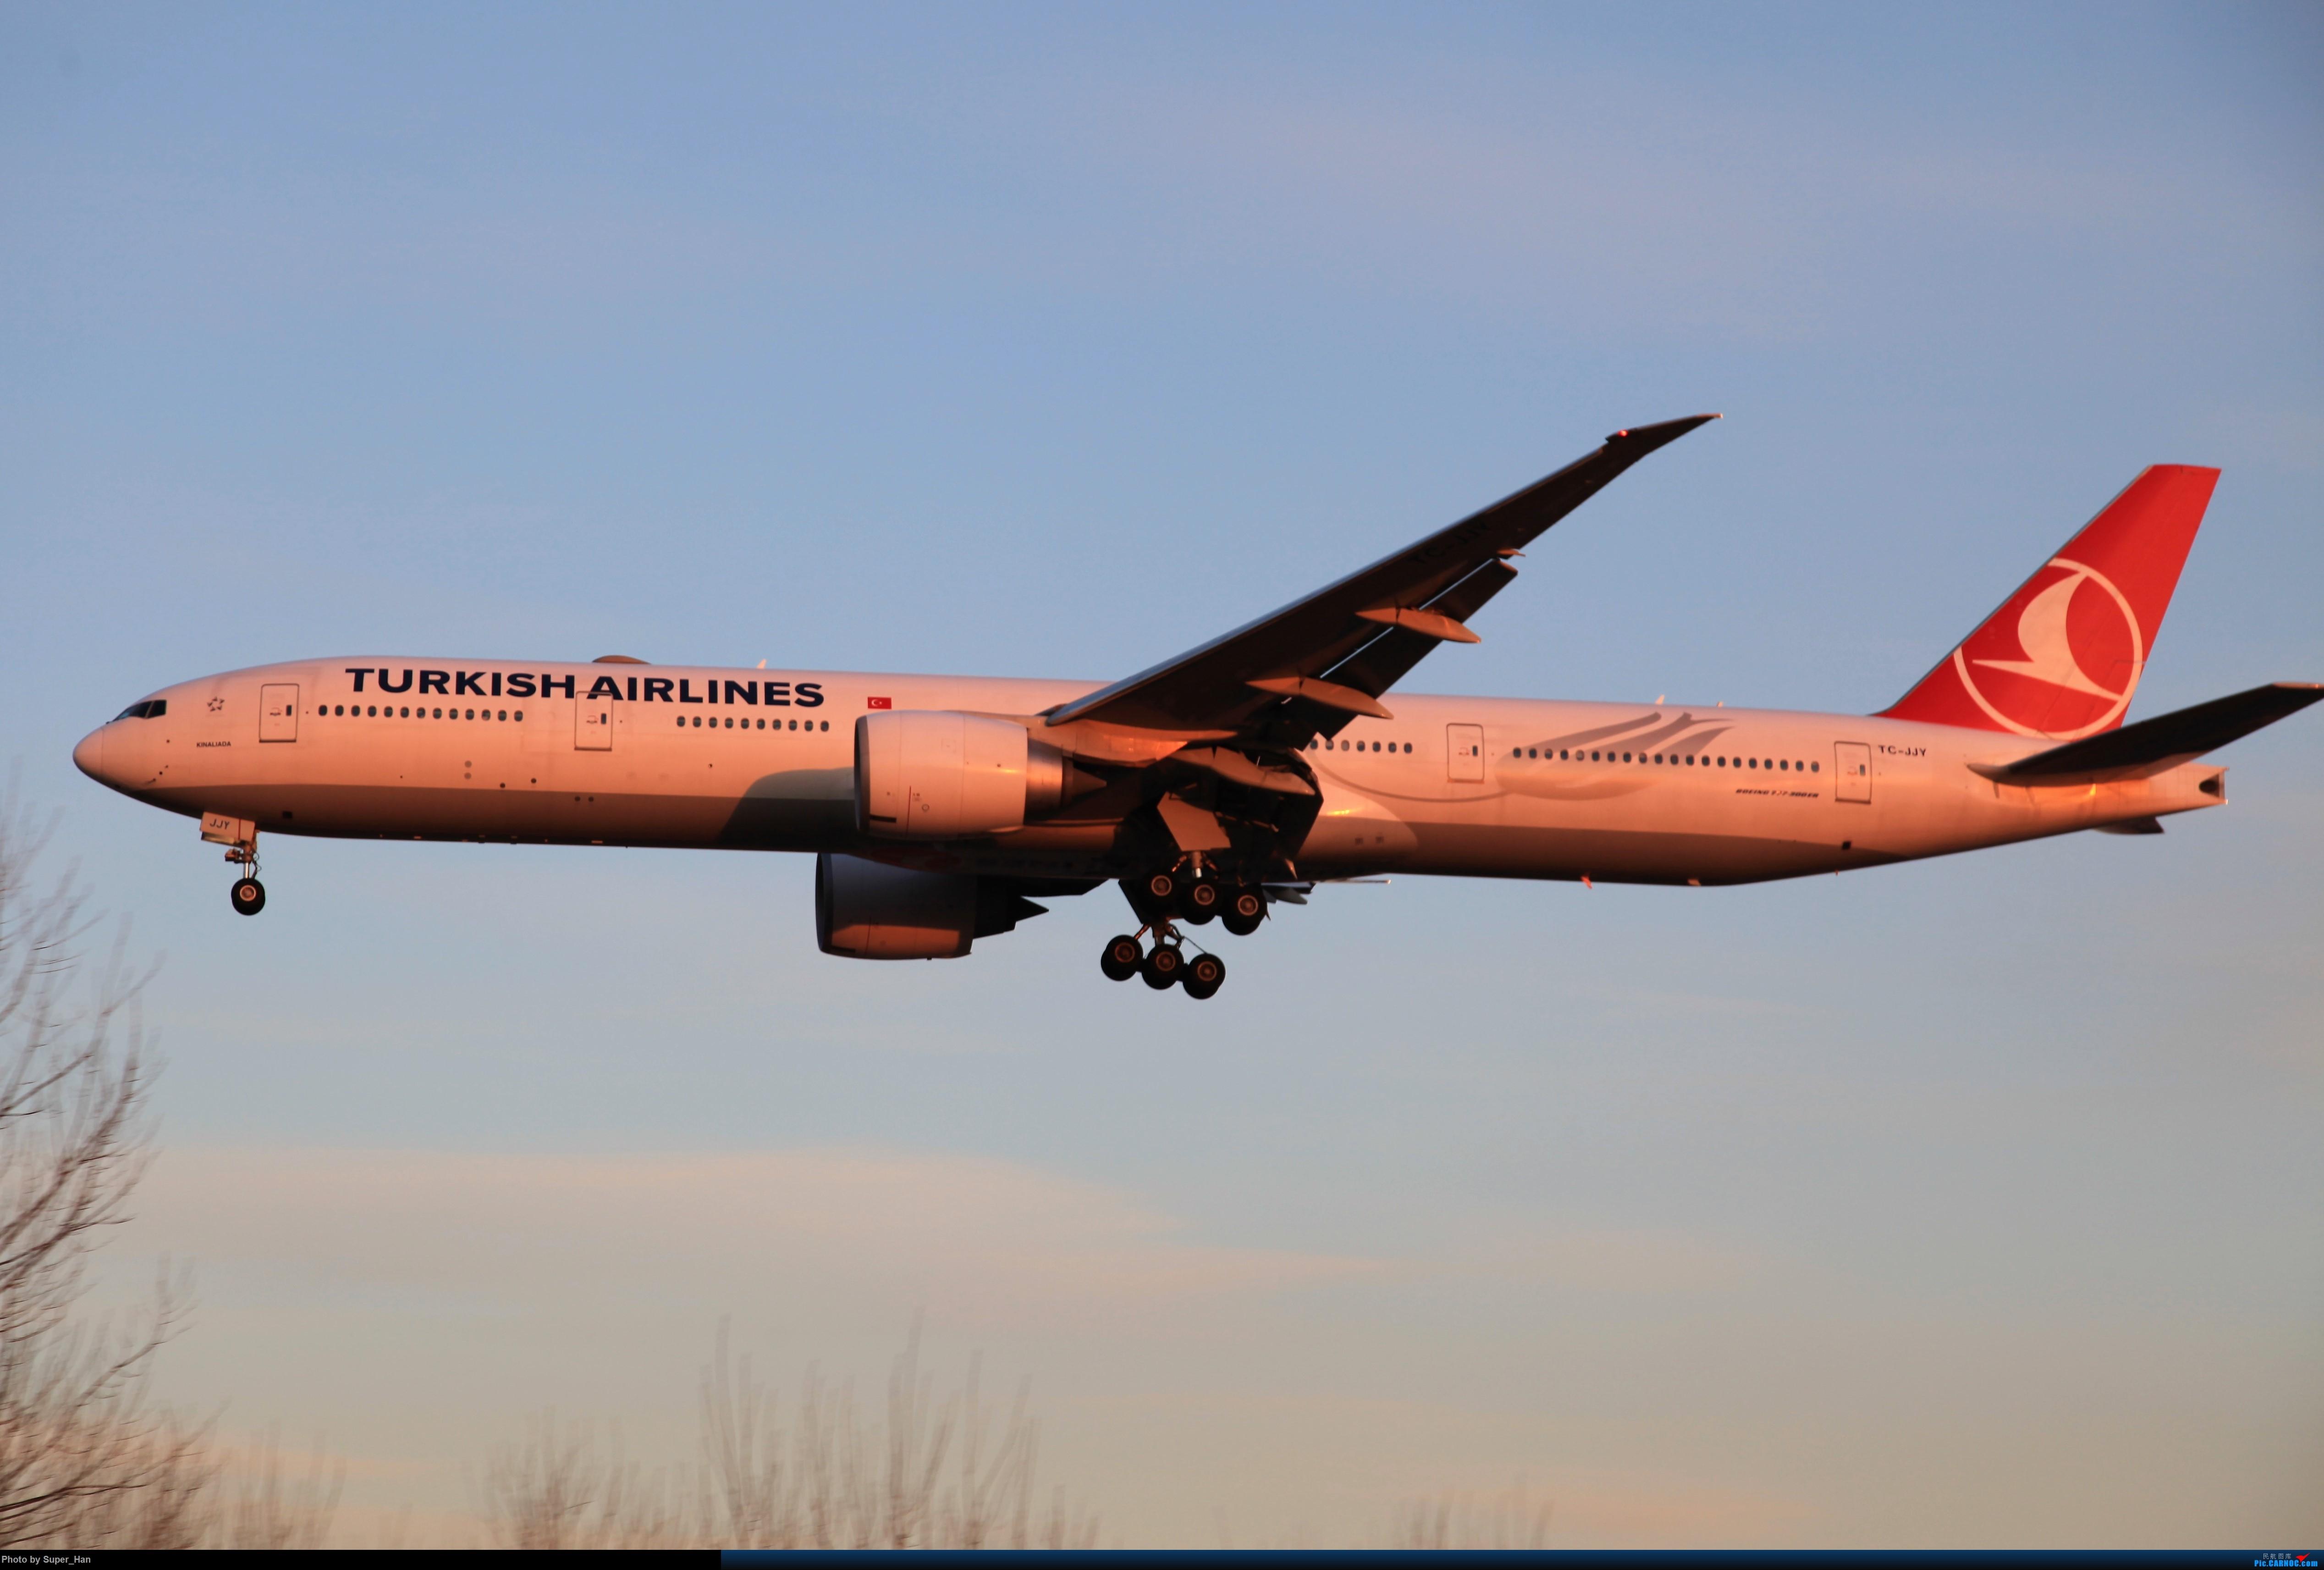 Re:[原创]1月17日PEK BOEING 777-300ER TC-JJY 中国北京首都国际机场